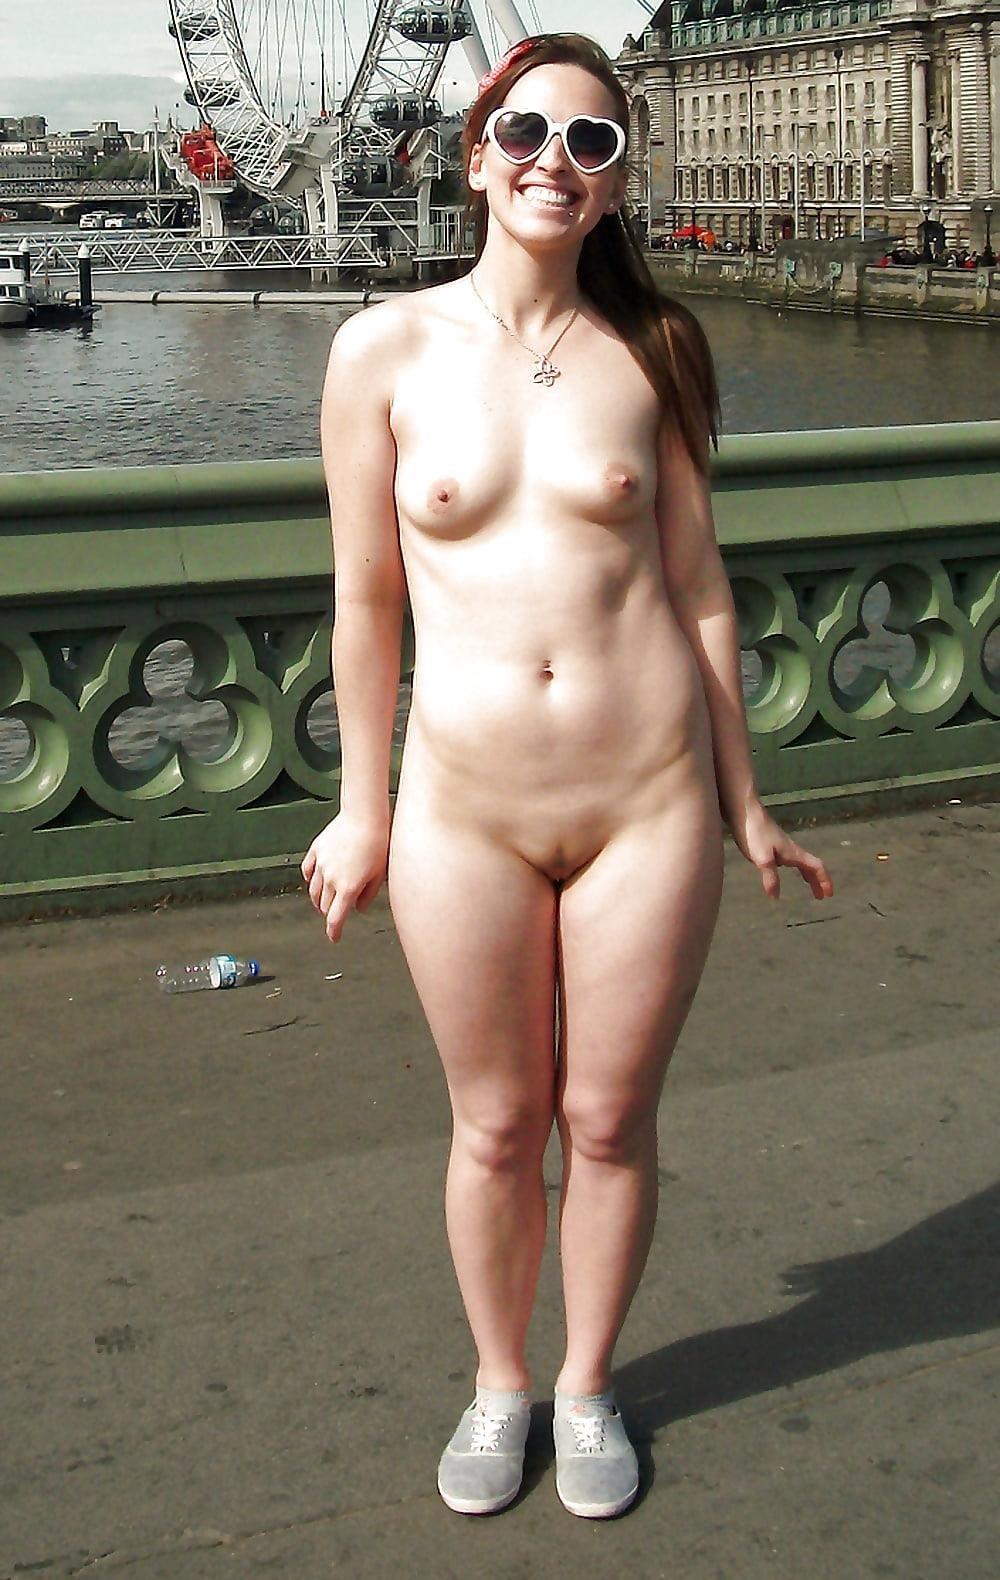 Girls peeing outside naked-9128